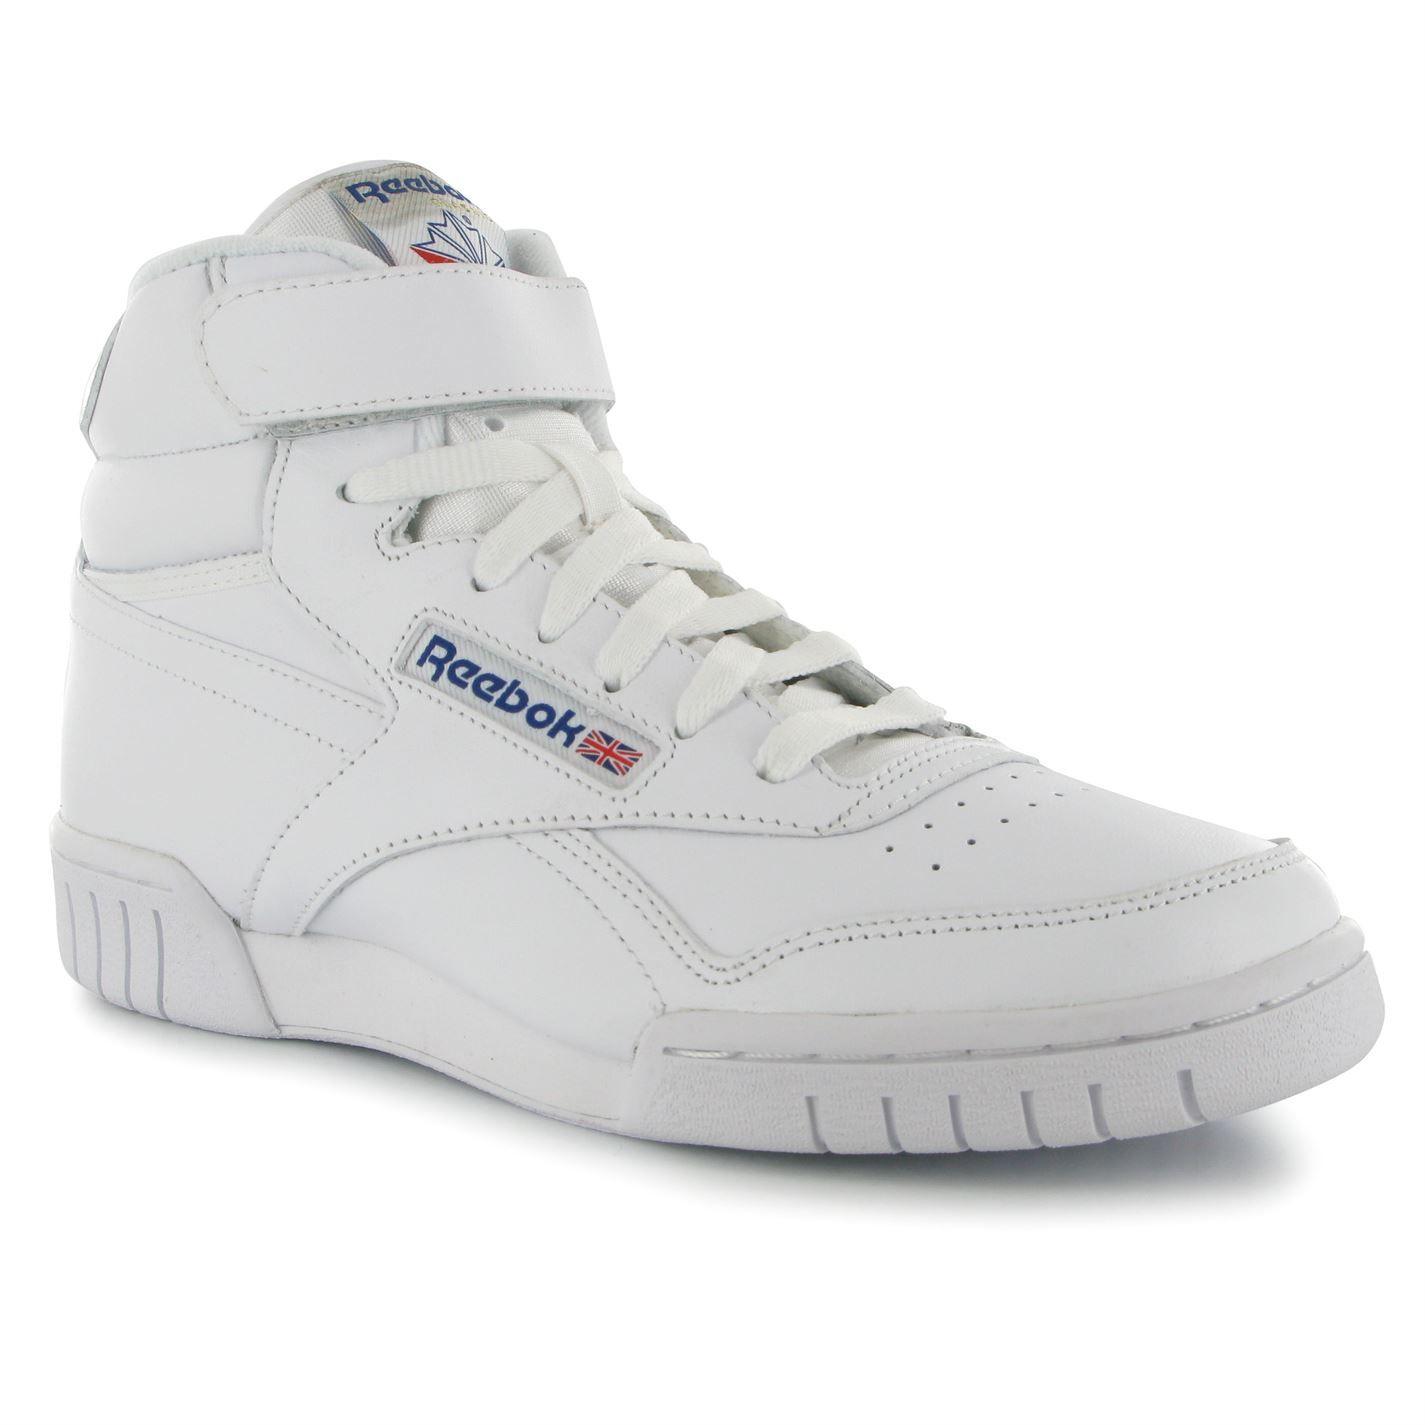 all white reebok high tops